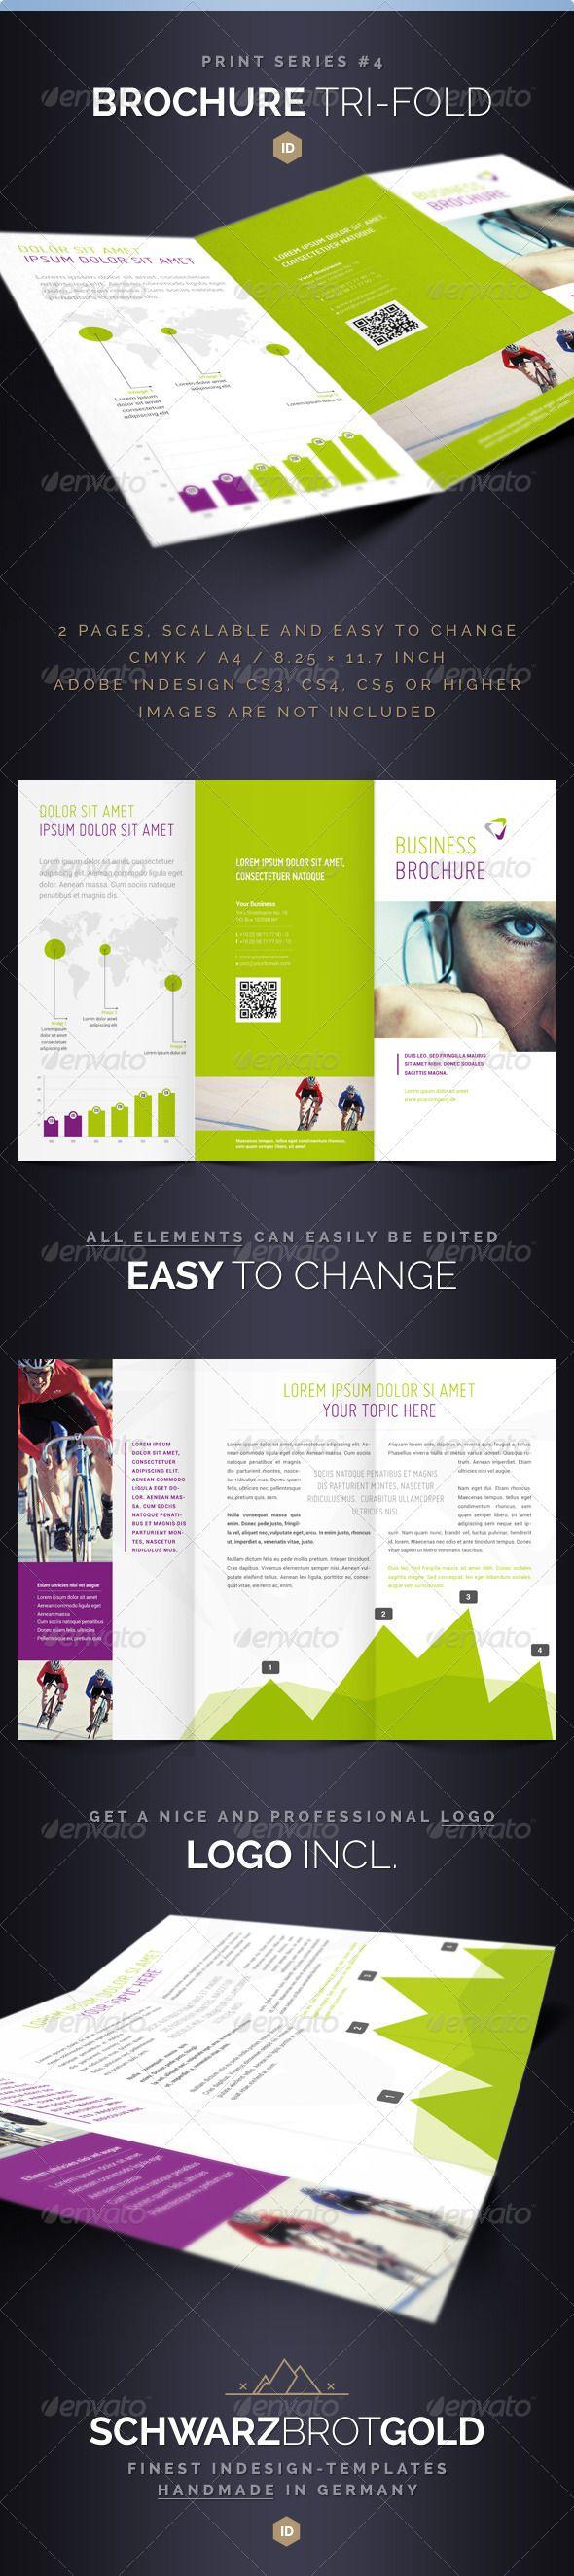 Brochure Tri-Fold DIN Long Series 4 - Corporate Brochures